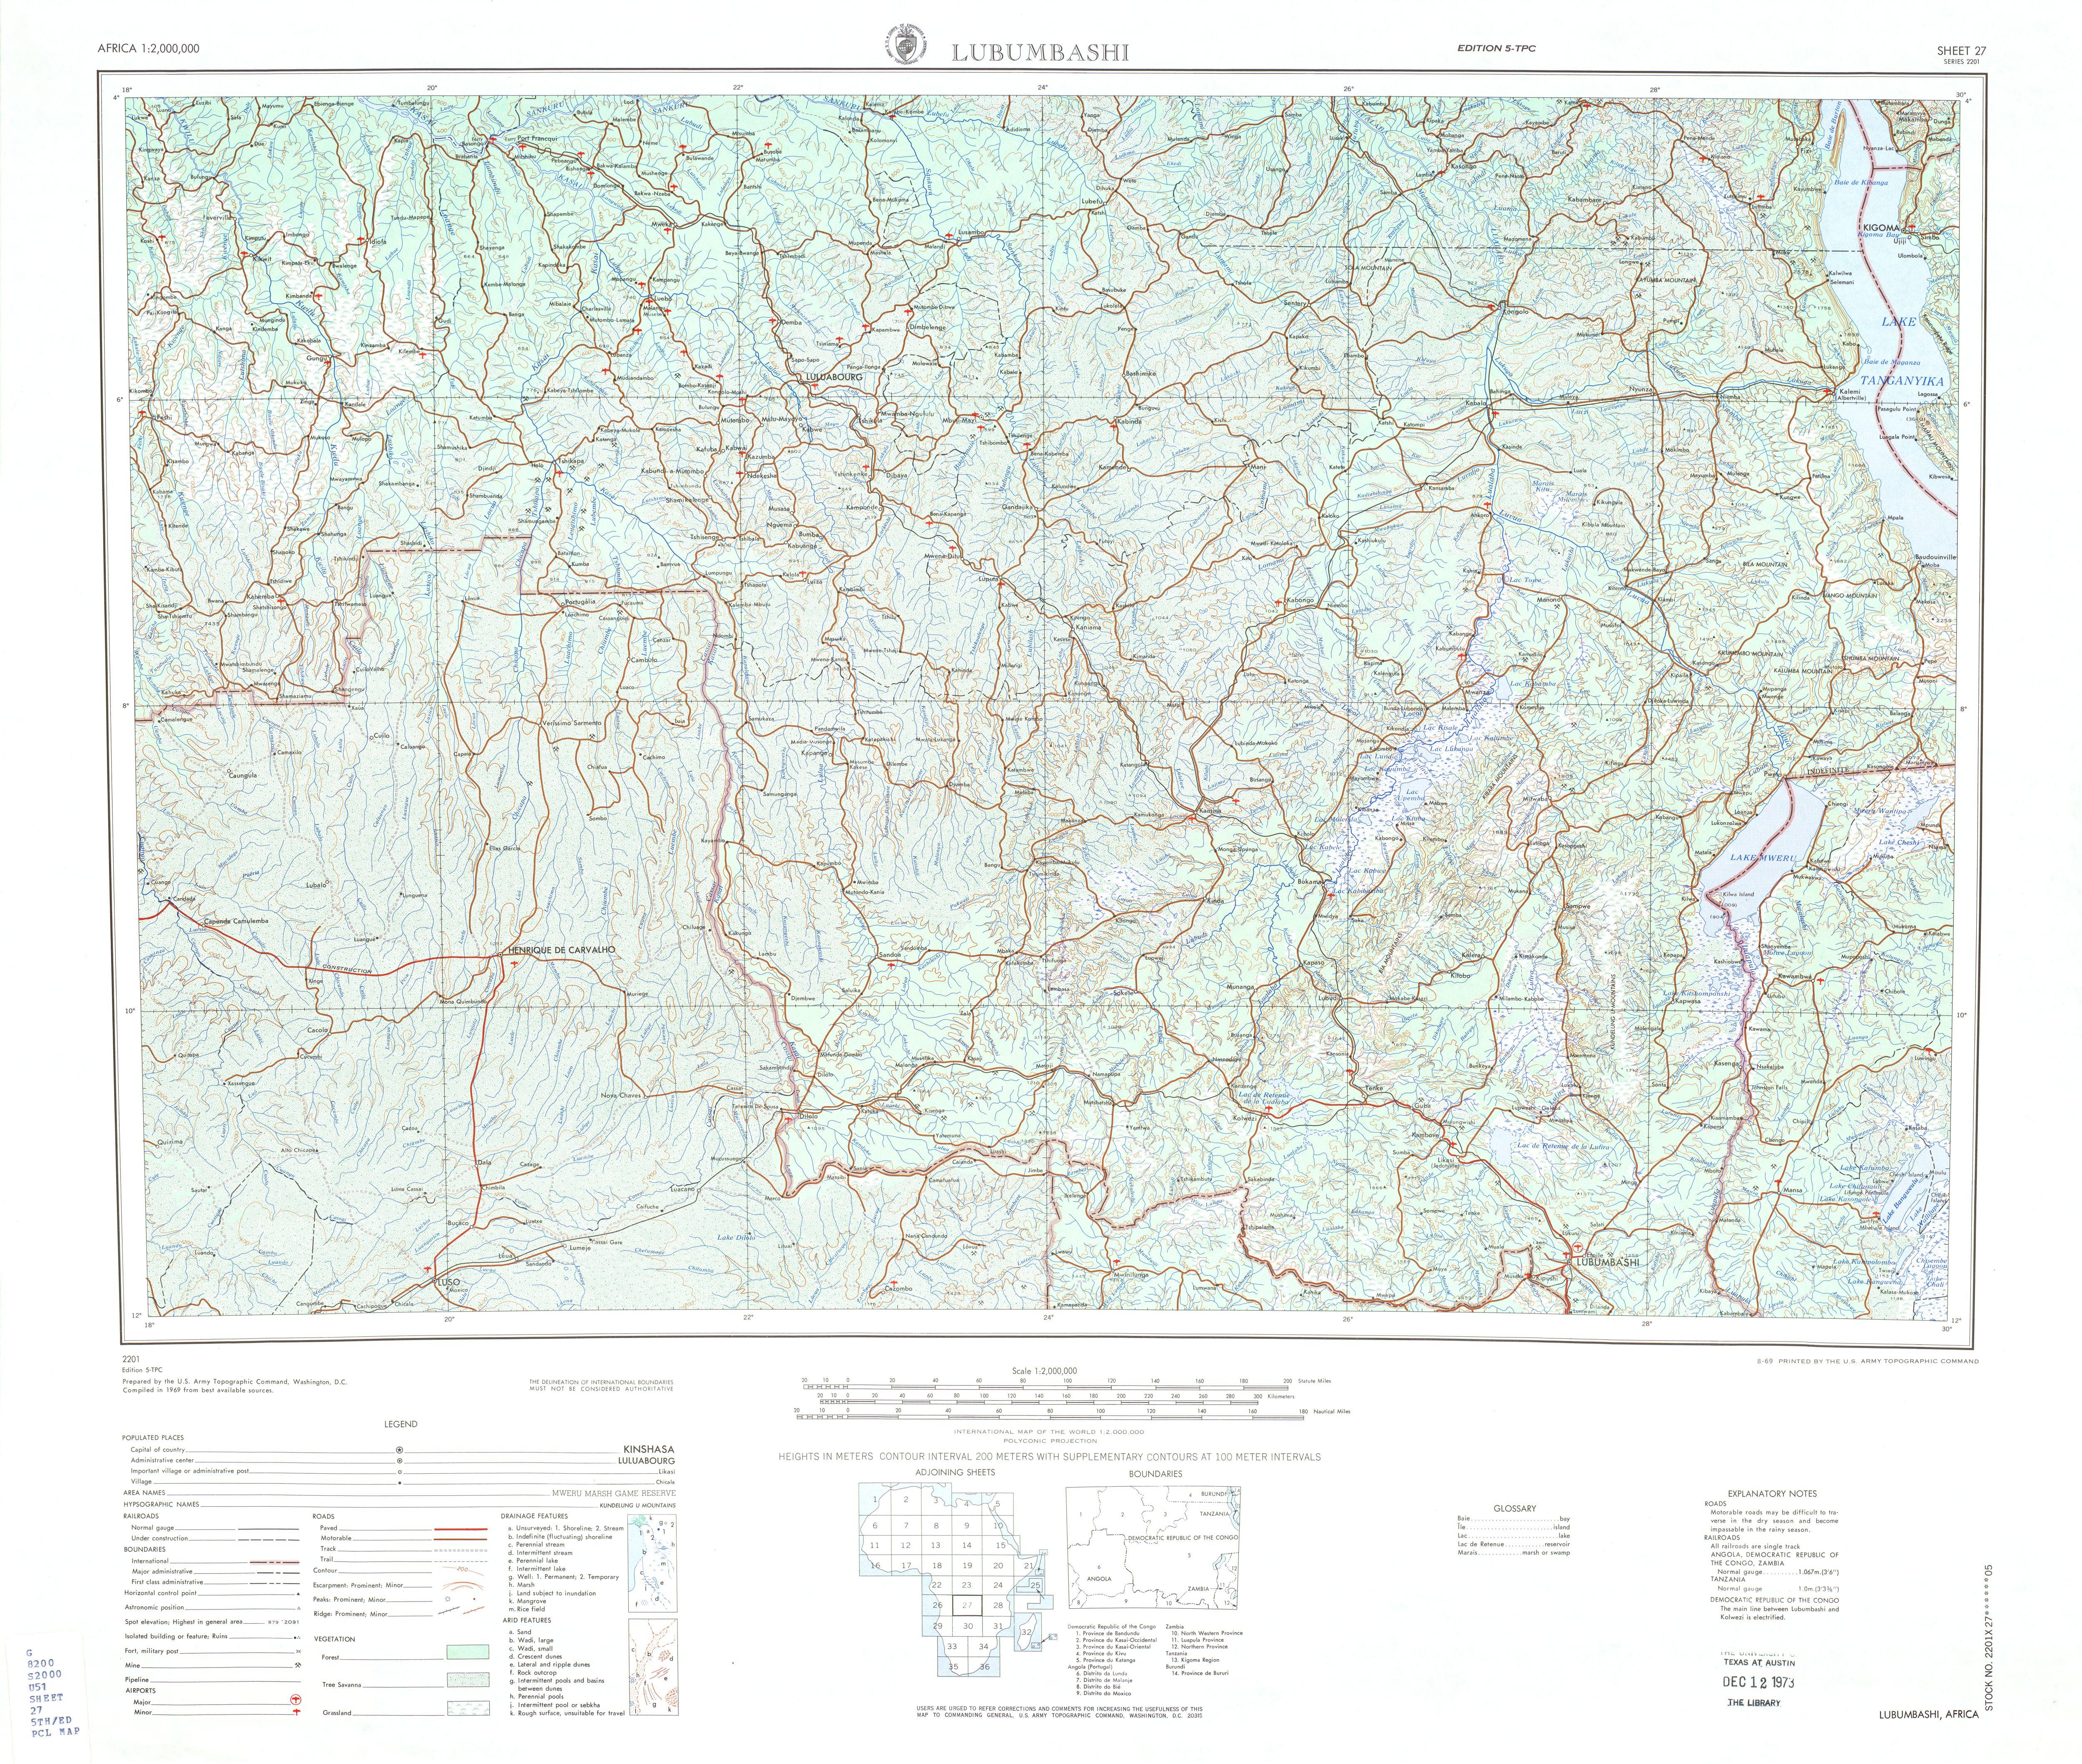 Hoja Lubumbashi del Mapa Topográfico de África 1969